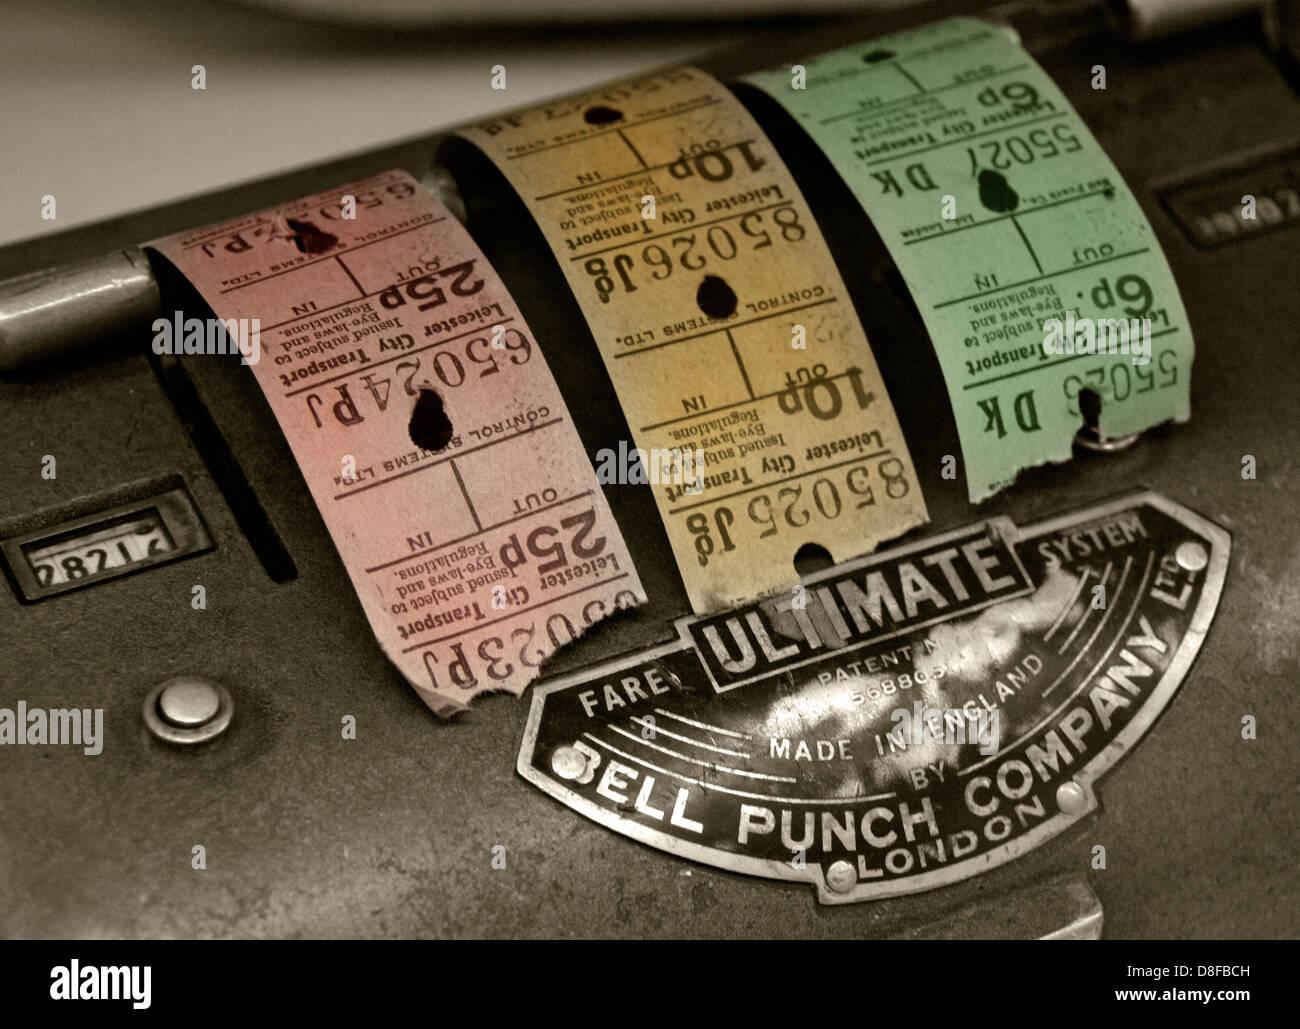 Laden Sie dieses Alamy Stockfoto Busticket Bell Punch Maschine & Tickets aus Coventry, England UK - D8FBCH